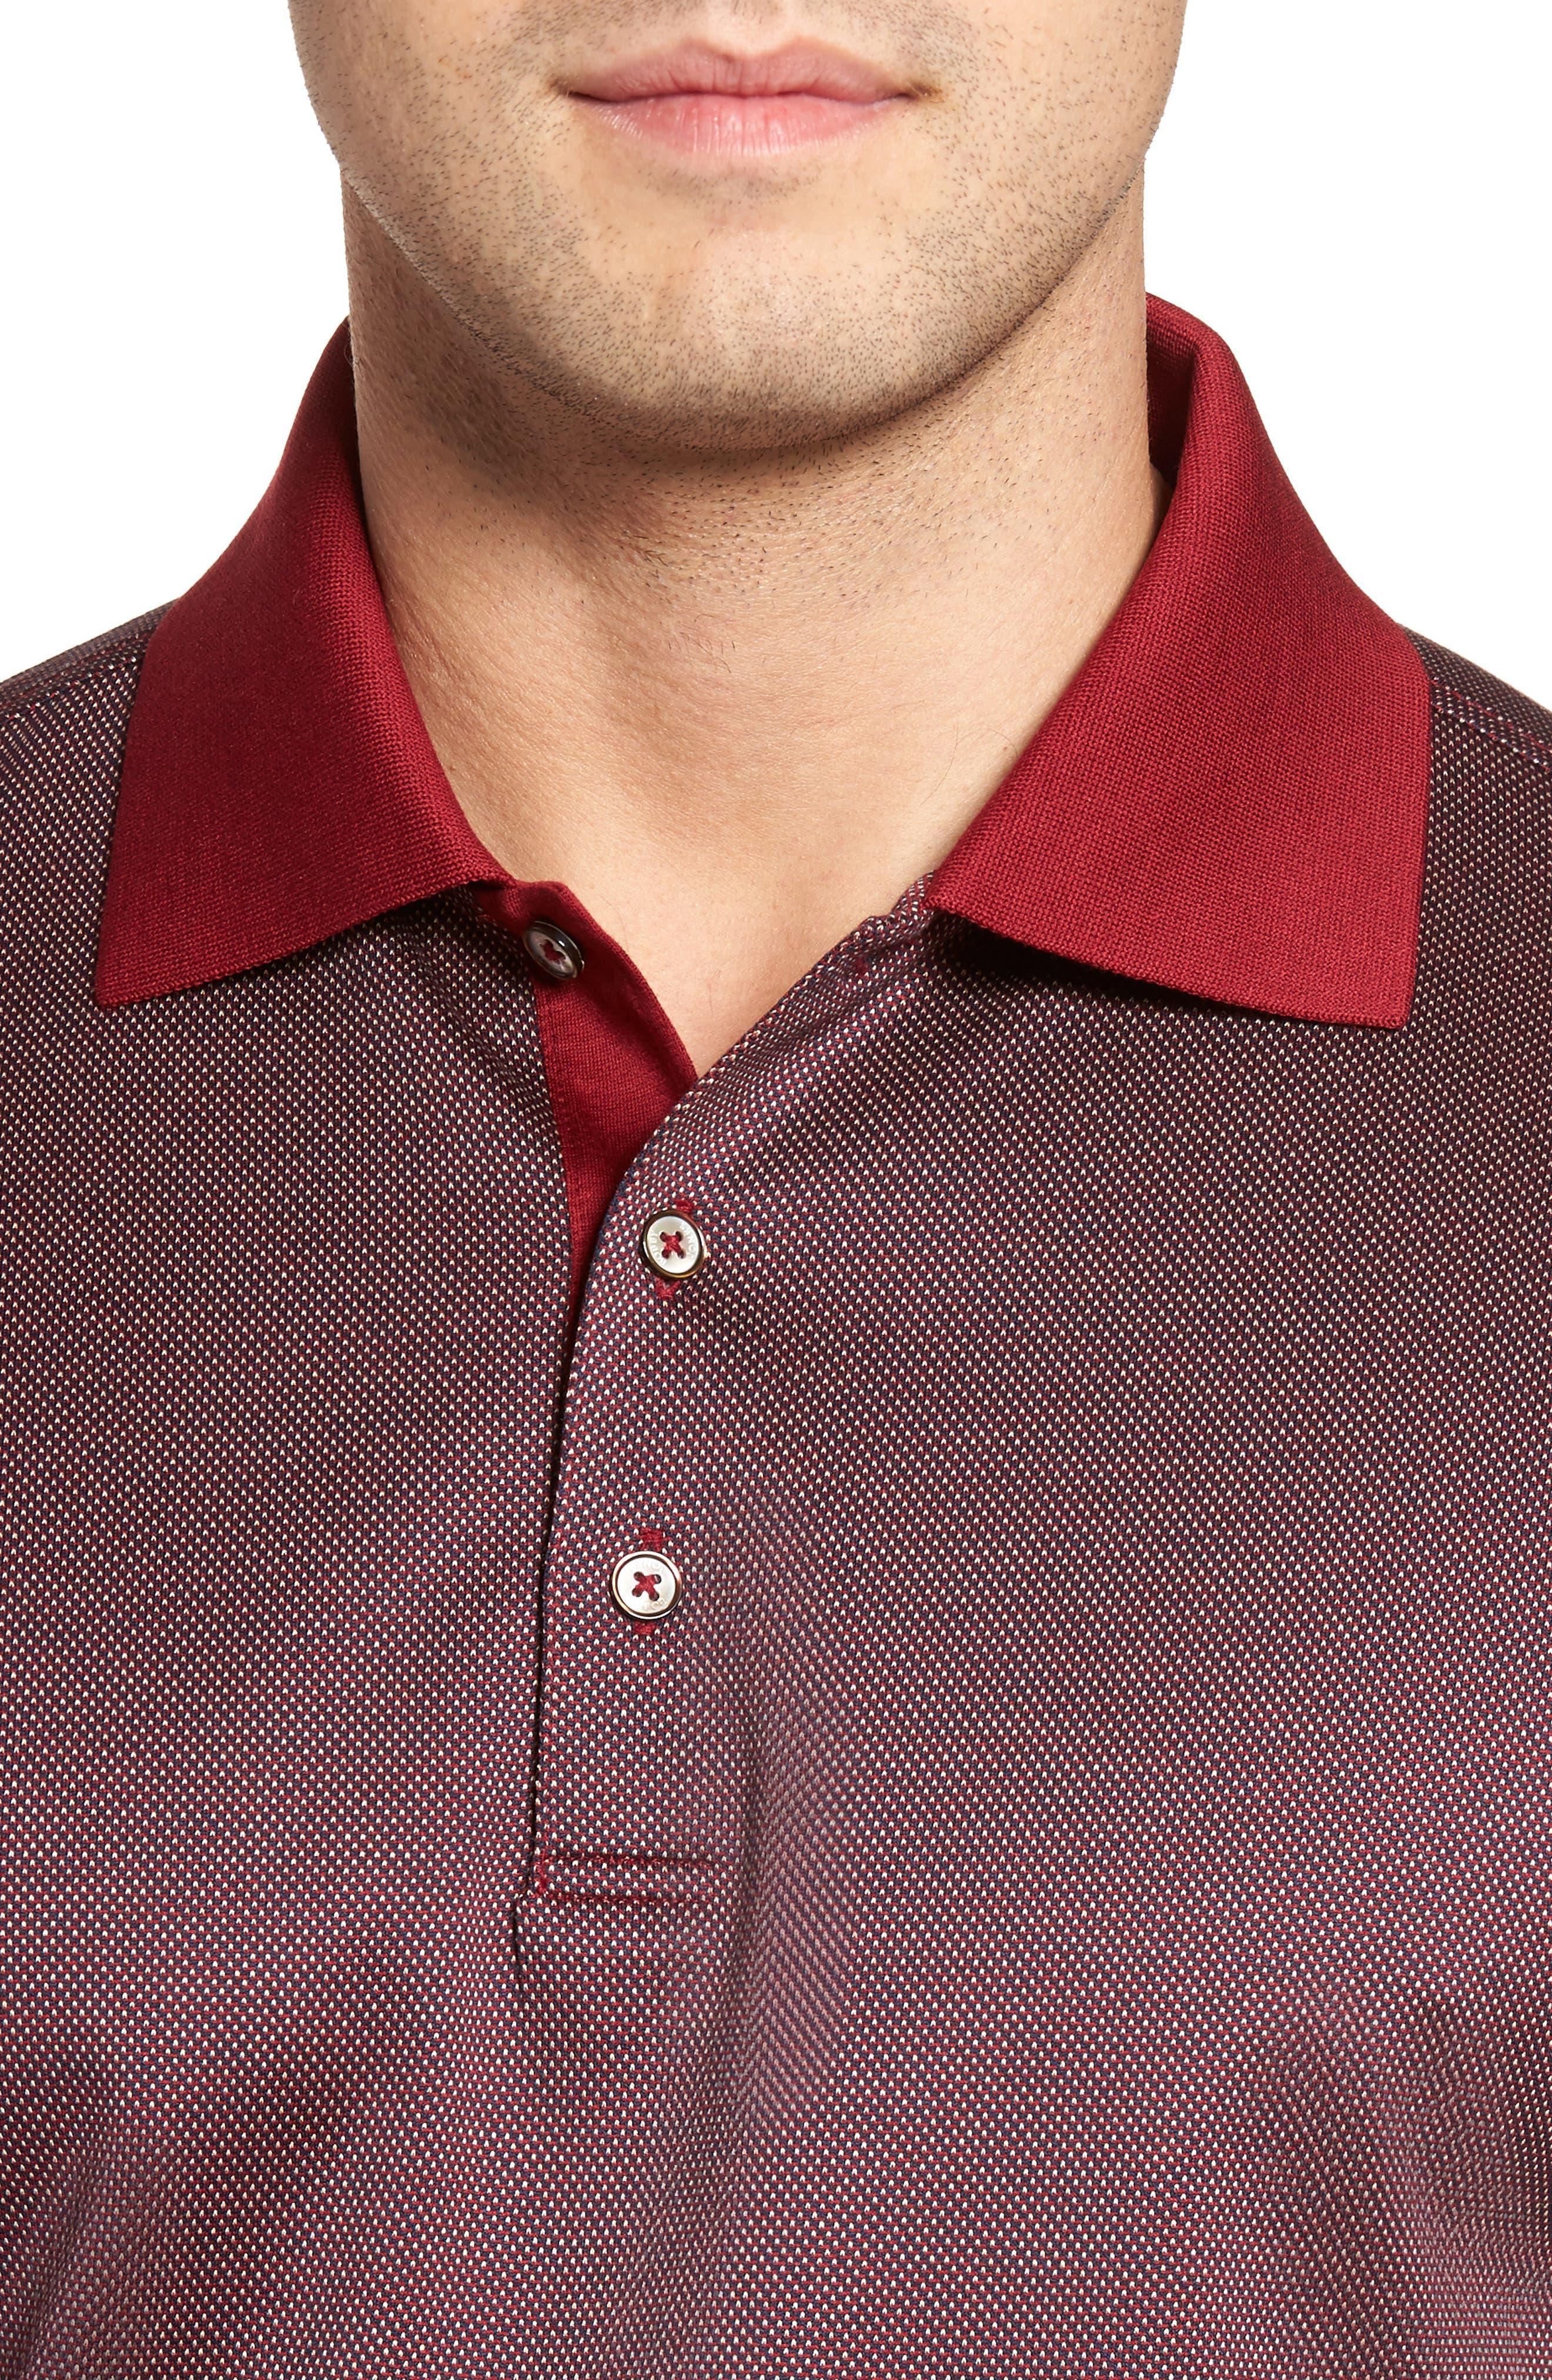 Verde Jacquard Mercerized Cotton Polo,                             Alternate thumbnail 4, color,                             Brick Red